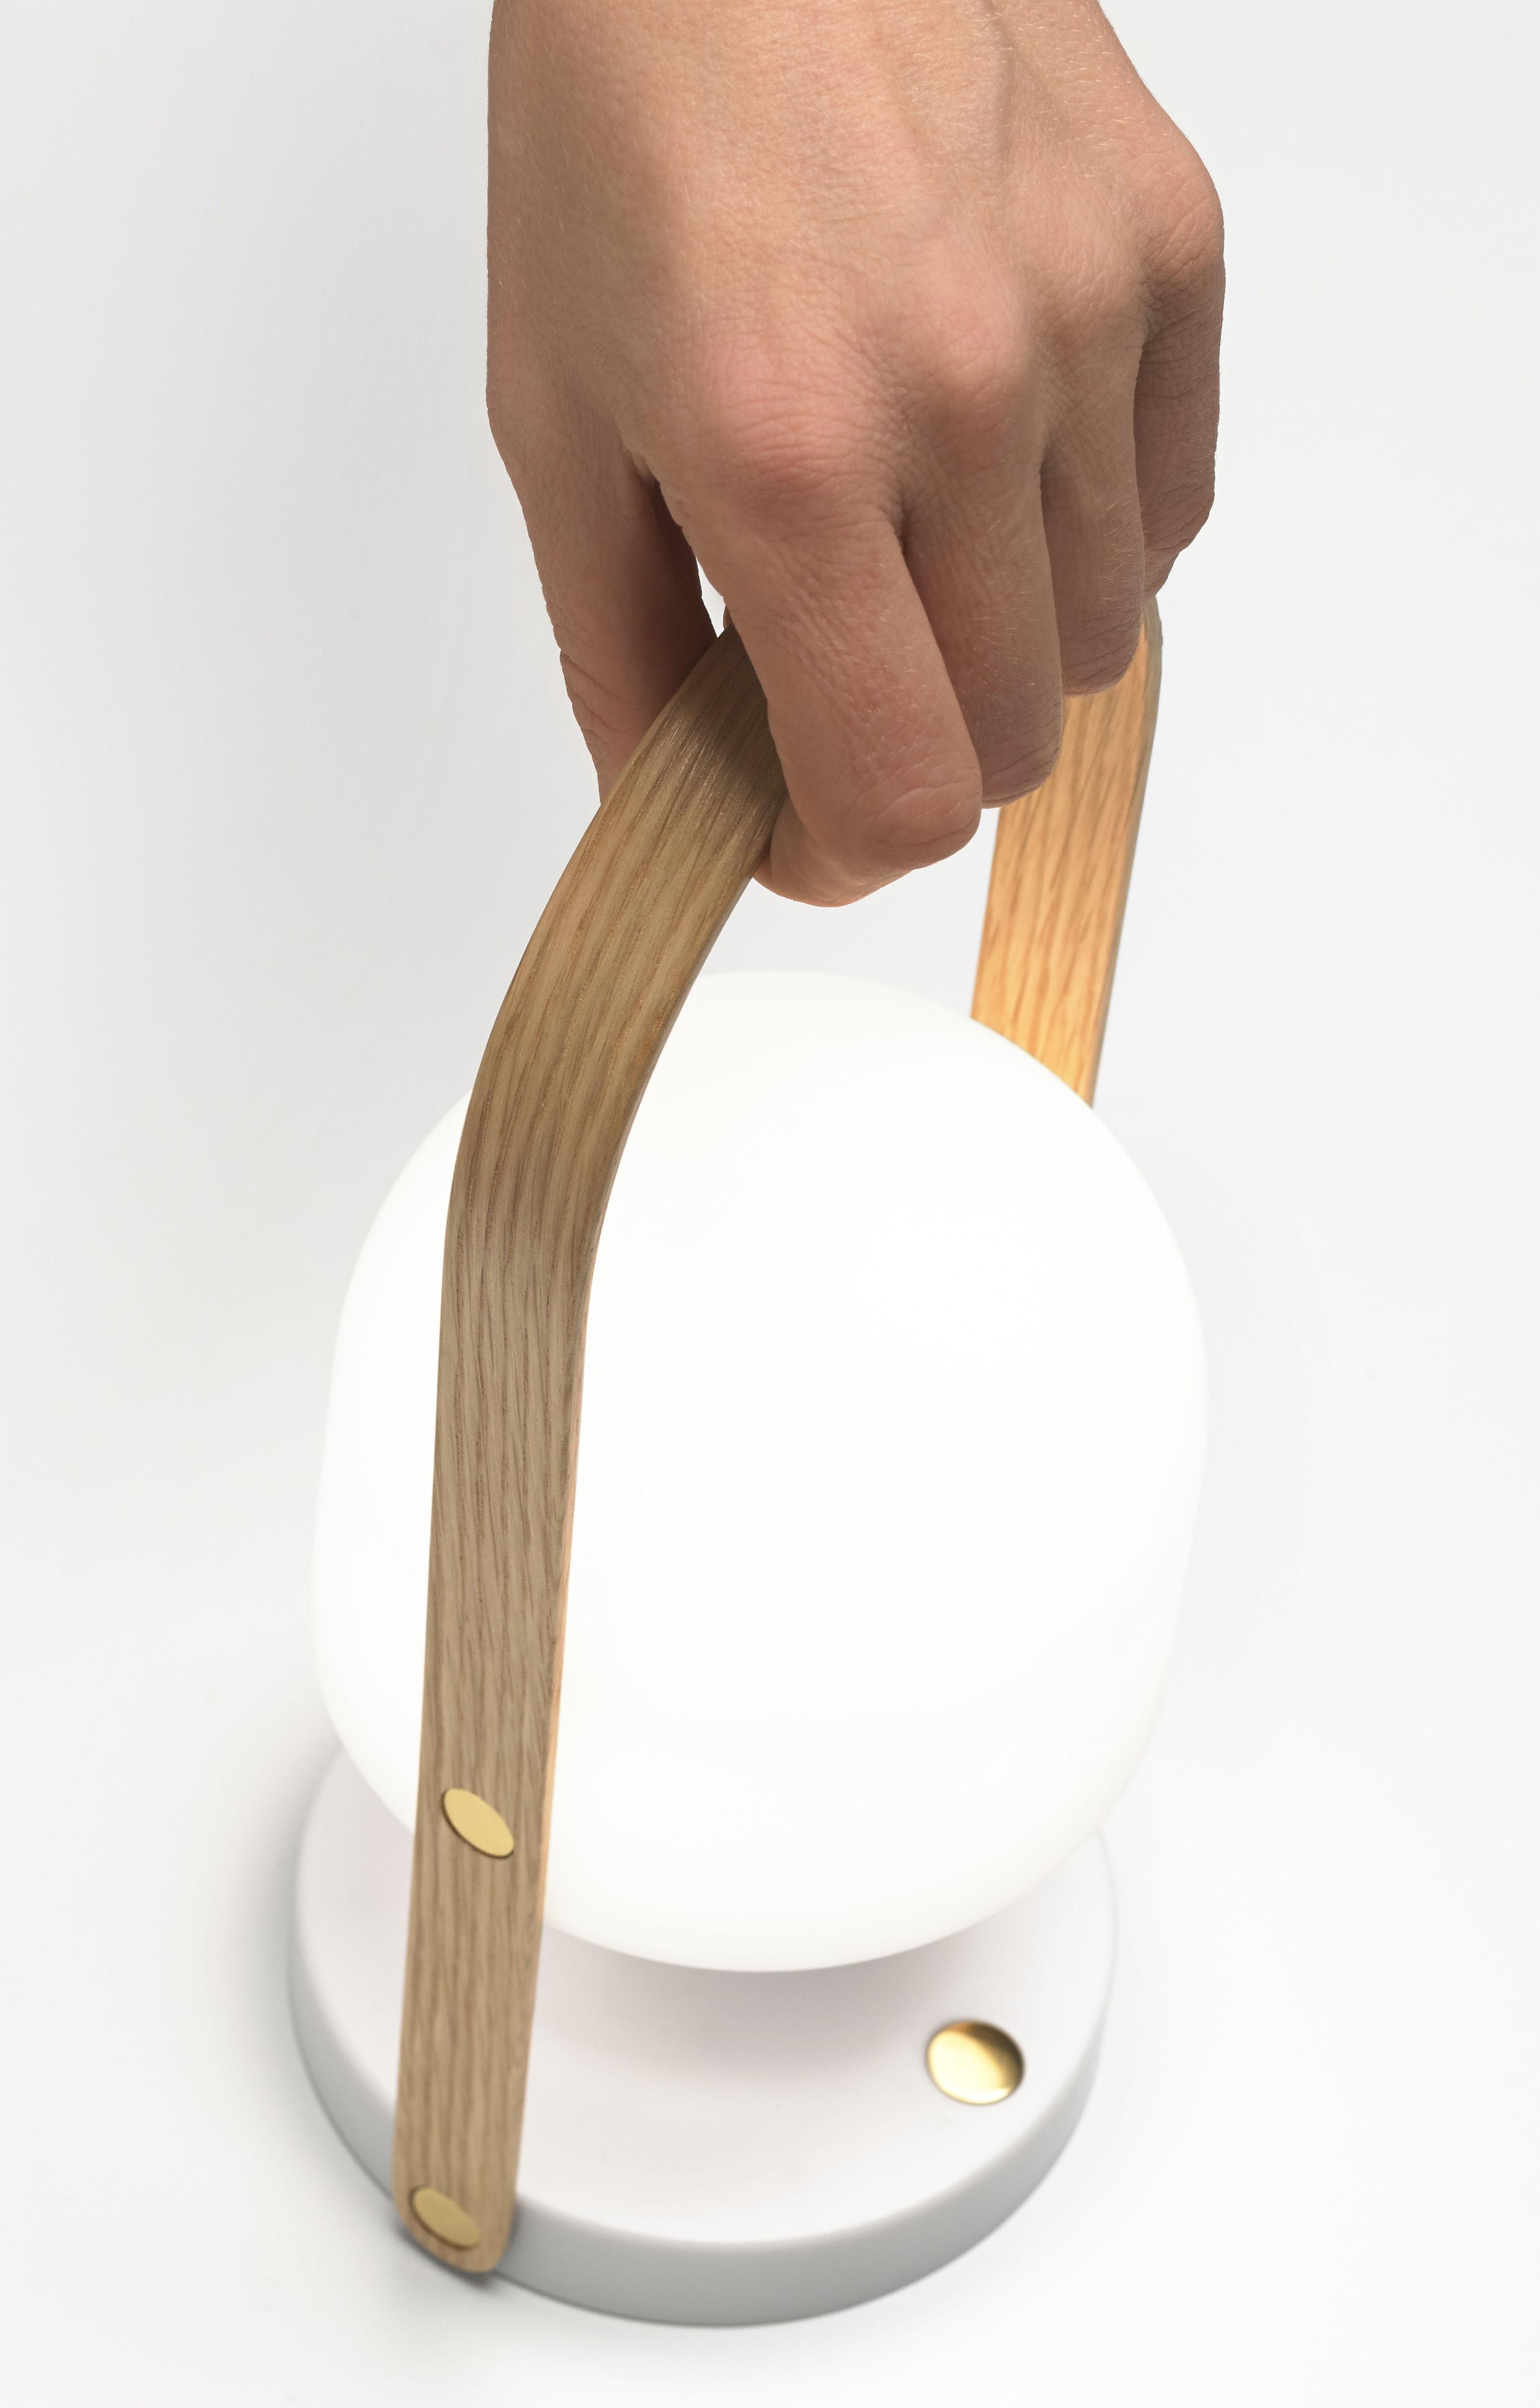 Lampe Sans Fil Followme Led H 29 Cm H 29 Cm Blanc Bois